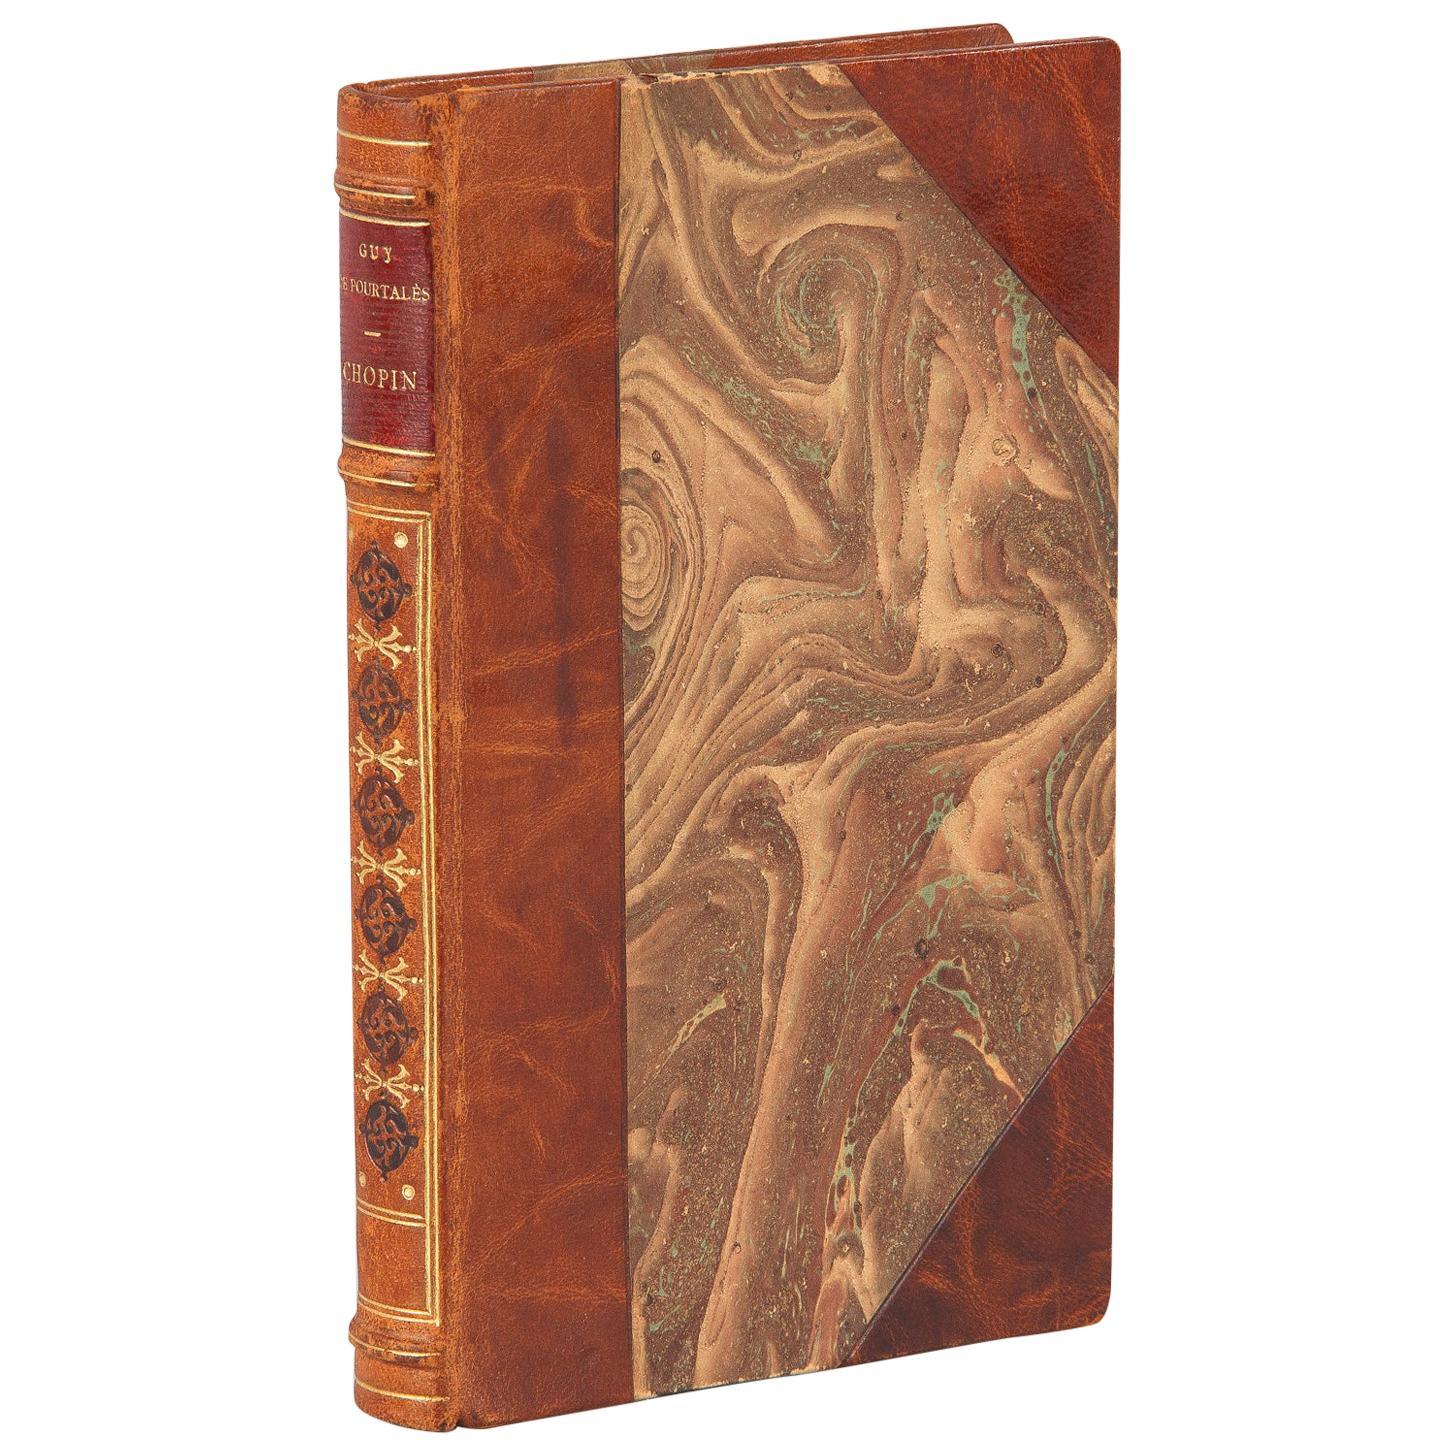 French Book, Chopin ou Le Poete by Guy de Pourtales, 1927